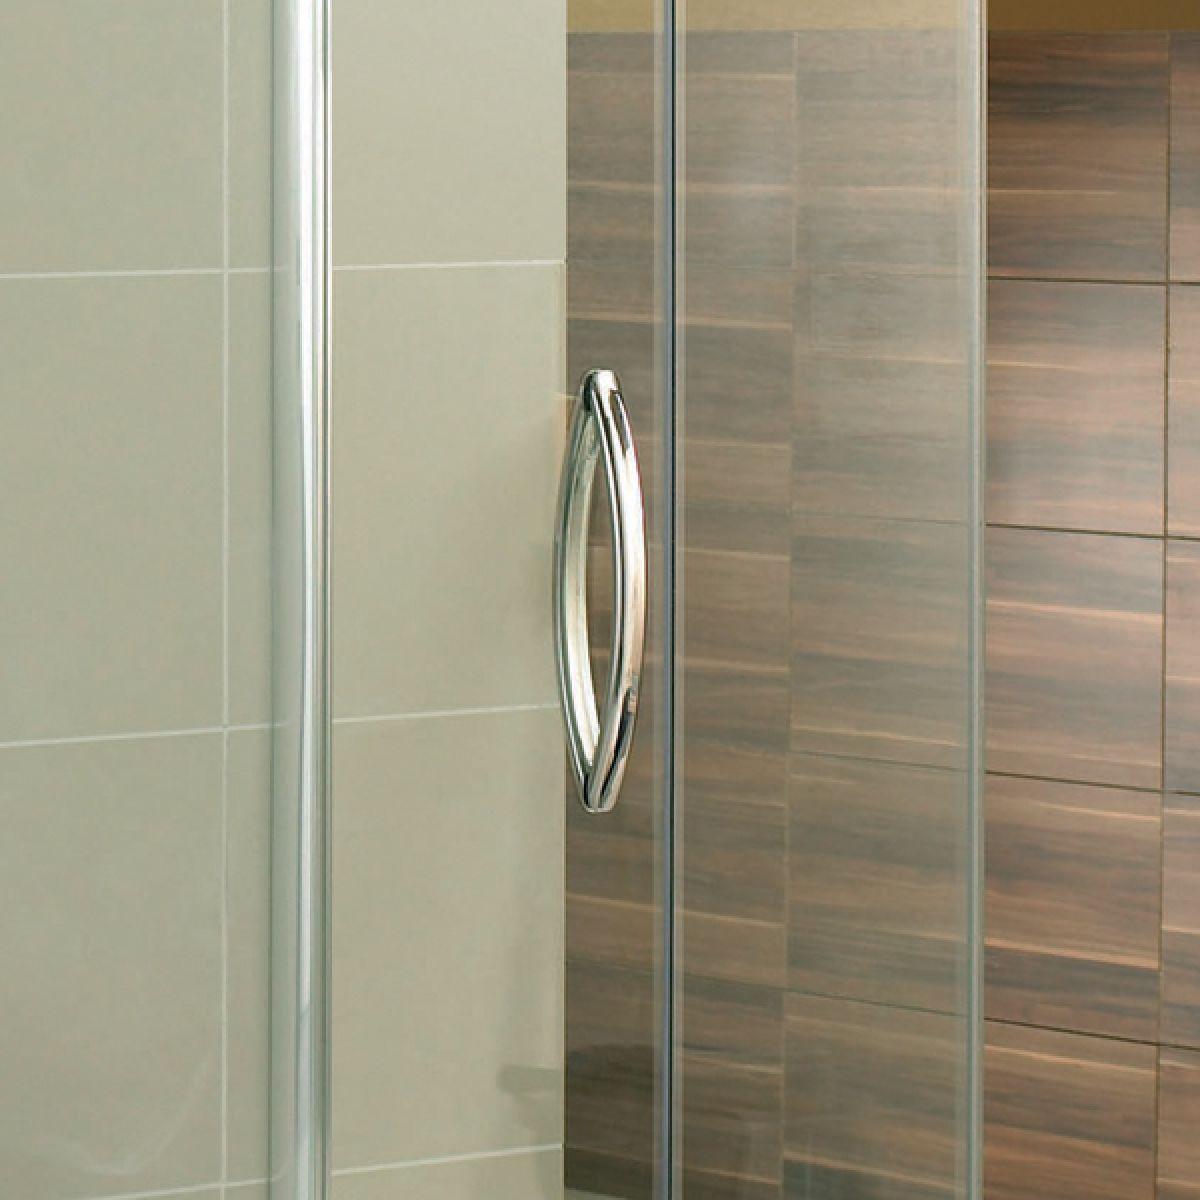 Aquadart Inline 3 Sided Hinged Door Shower Enclosure Detail 1